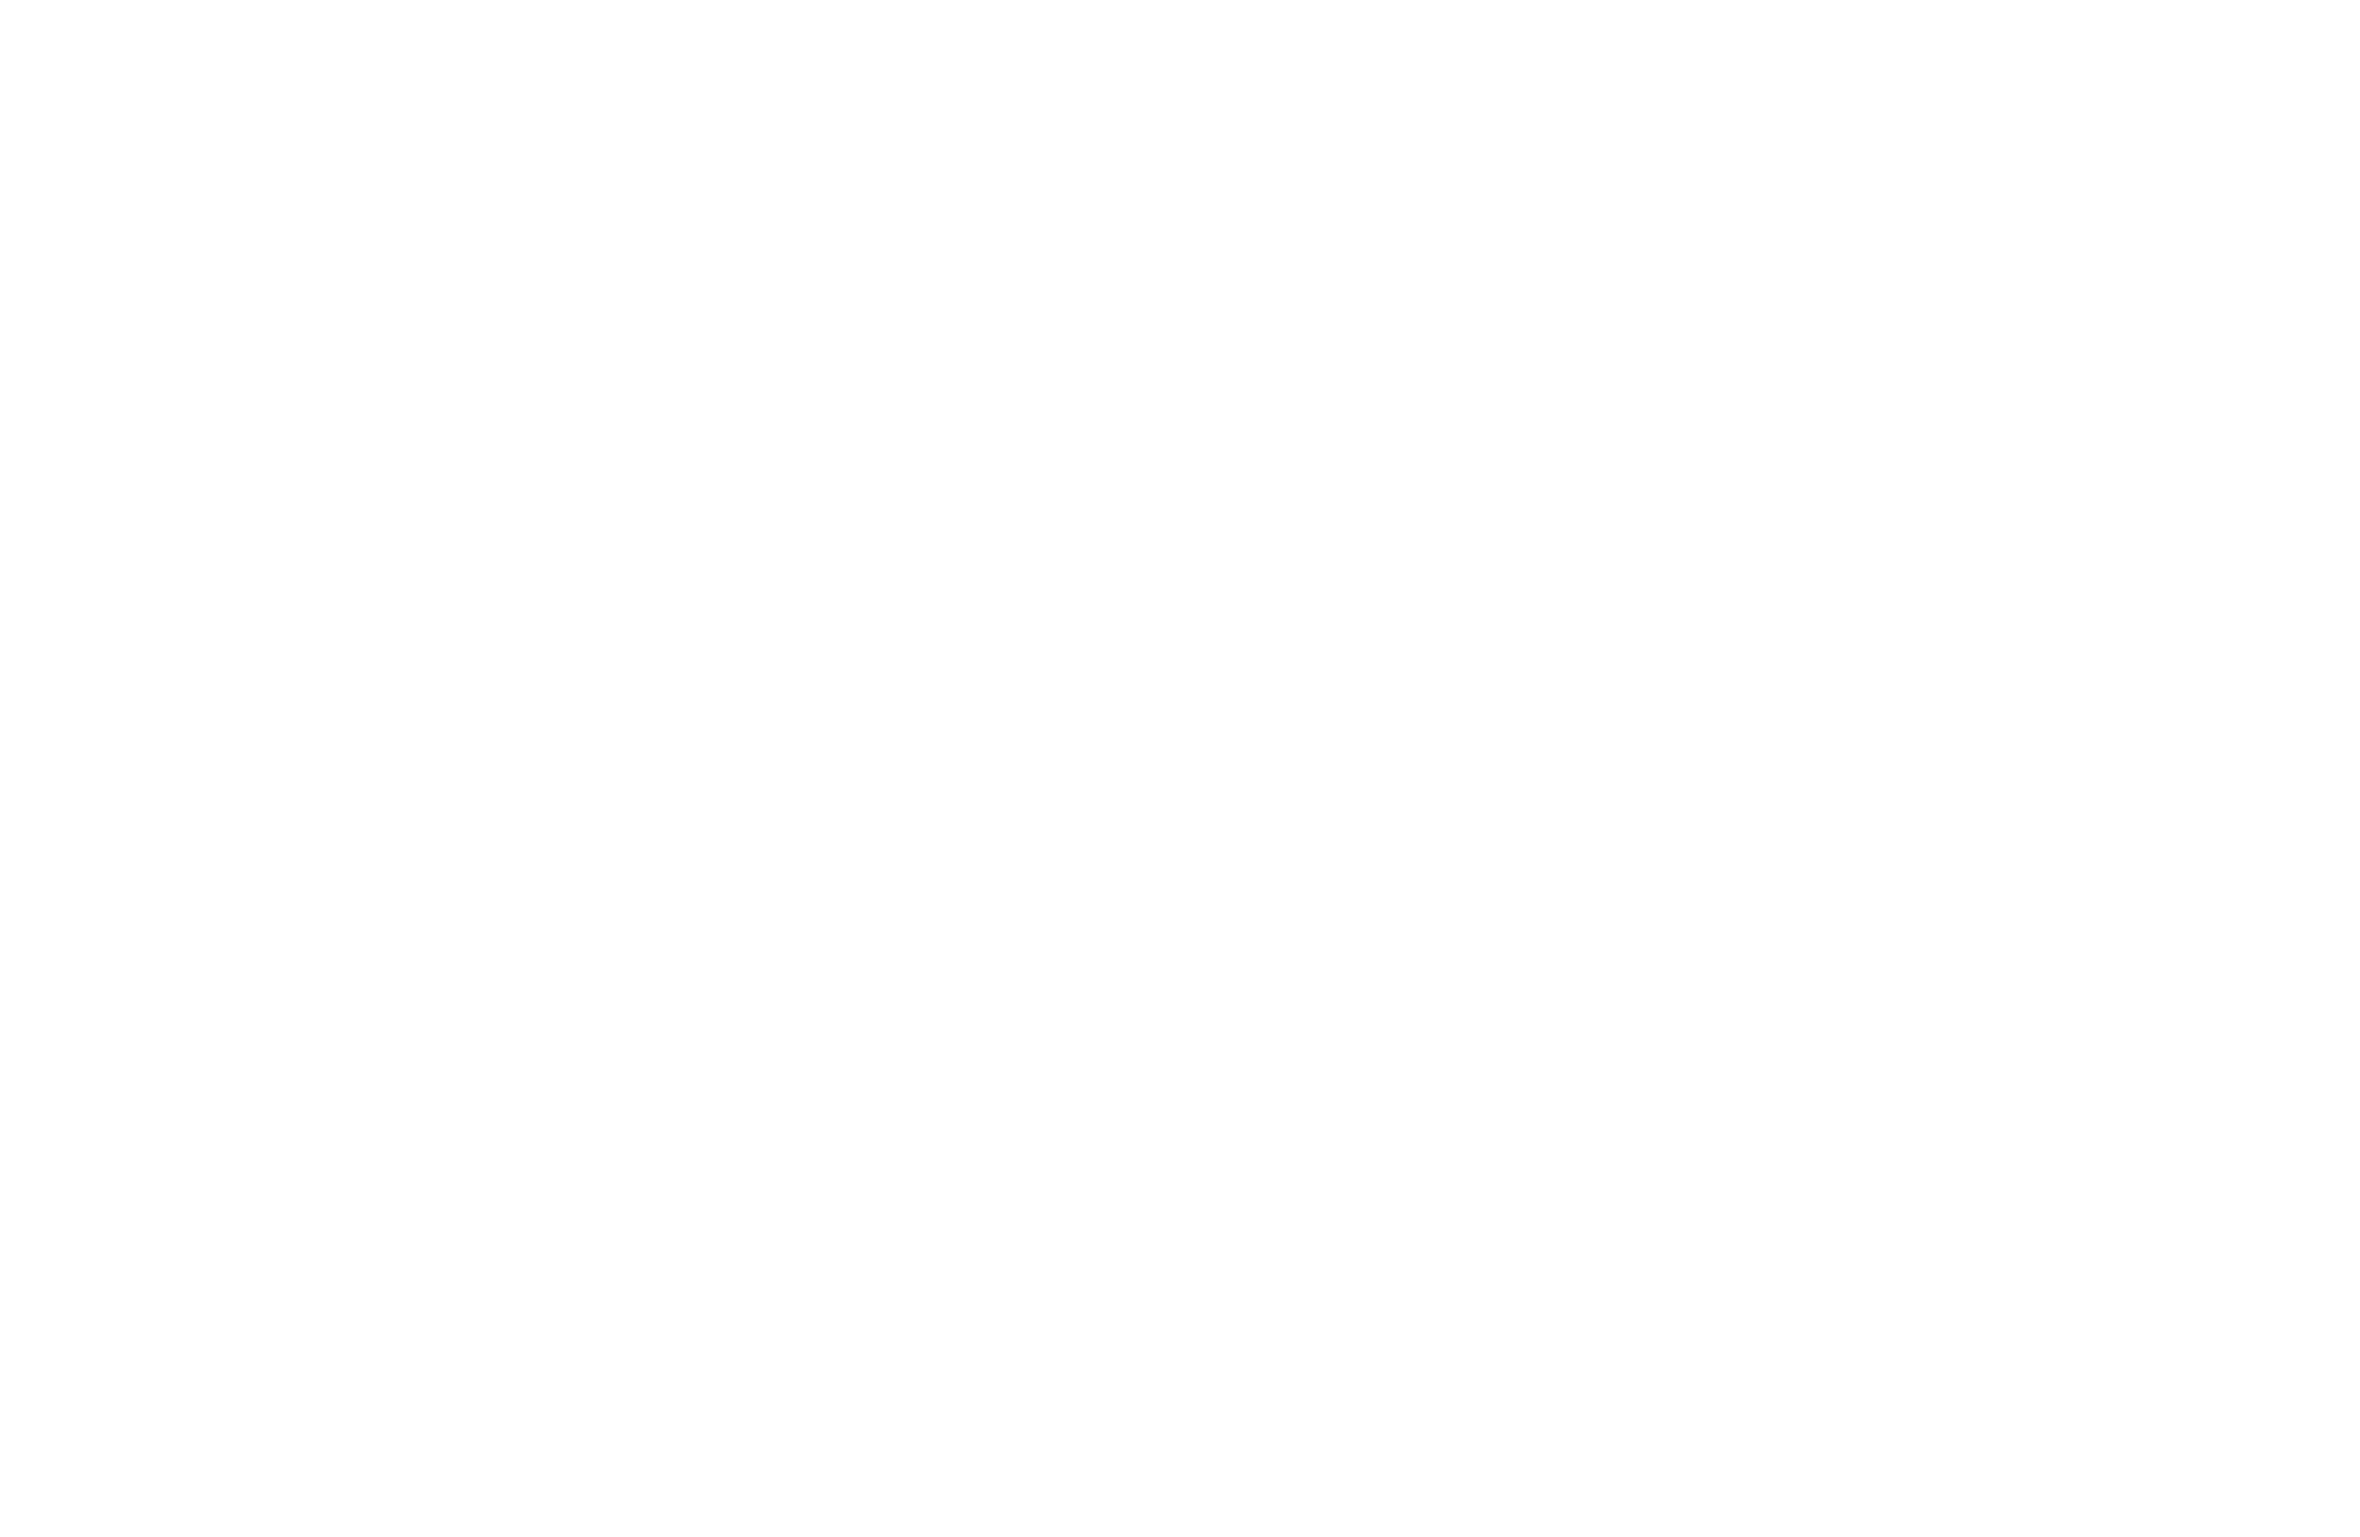 НТВ (ноябрь 1993, белый шарик)